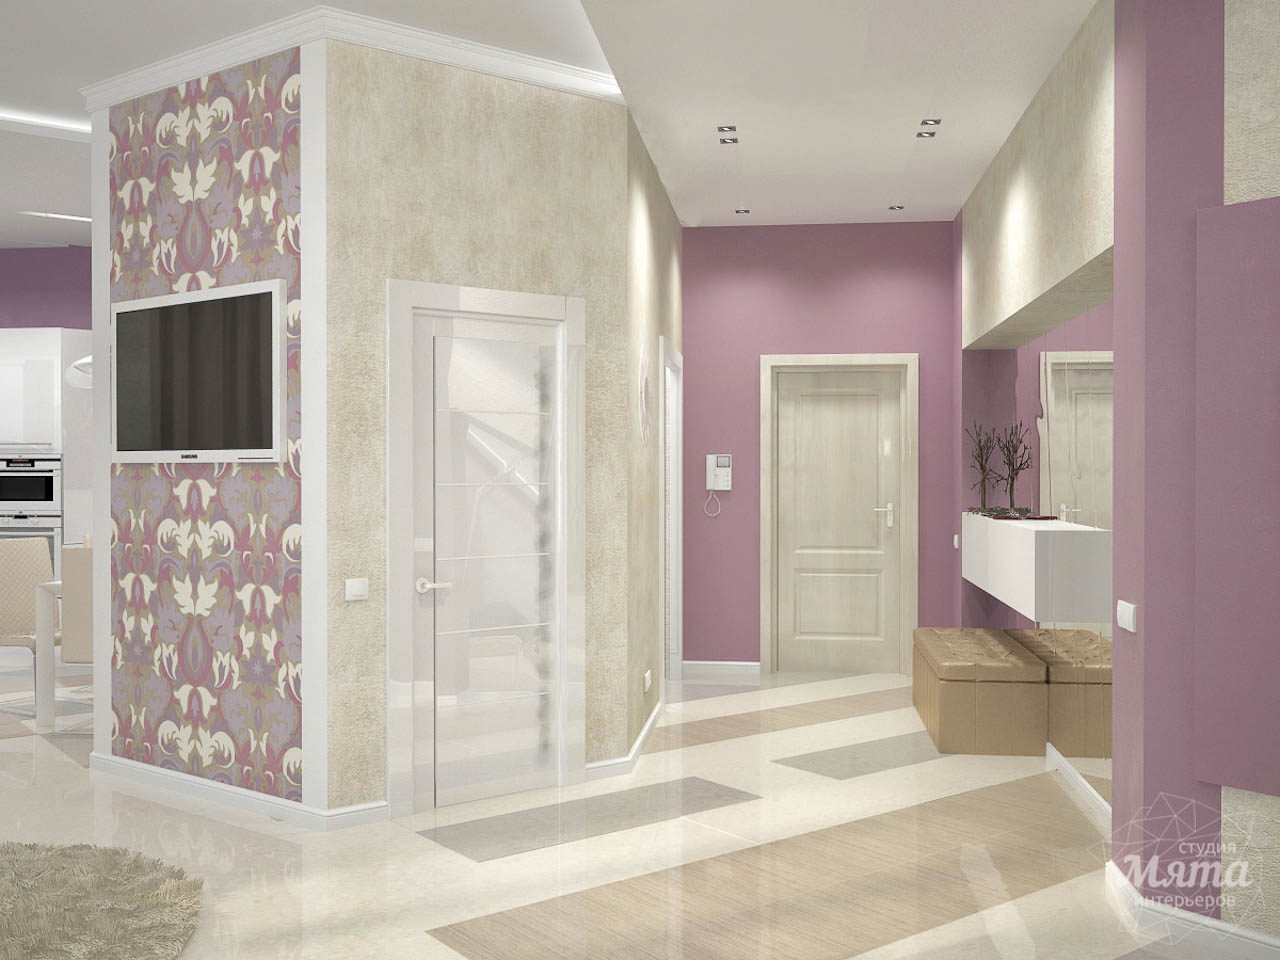 Дизайн интерьера и ремонт трехкомнатной квартиры по ул. Чкалова 124 img1057758407